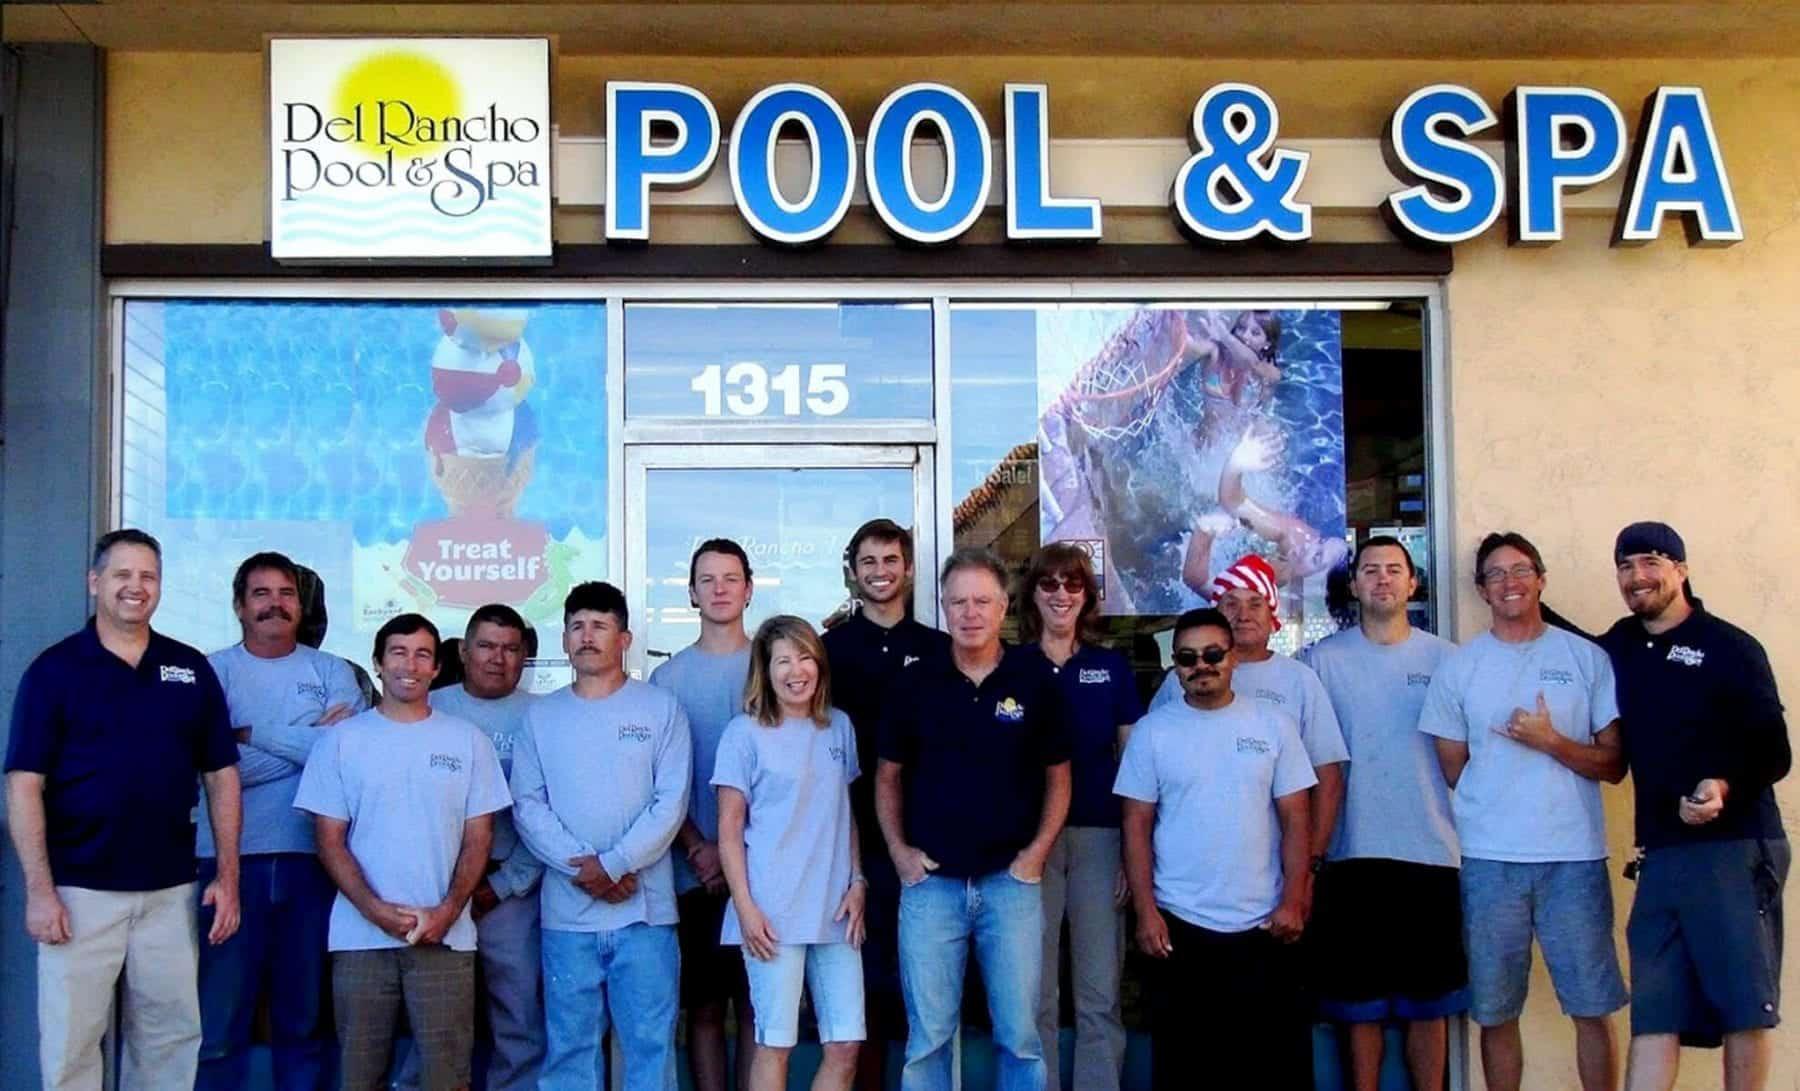 Del Rancho Pools San Diego - Our Team 1